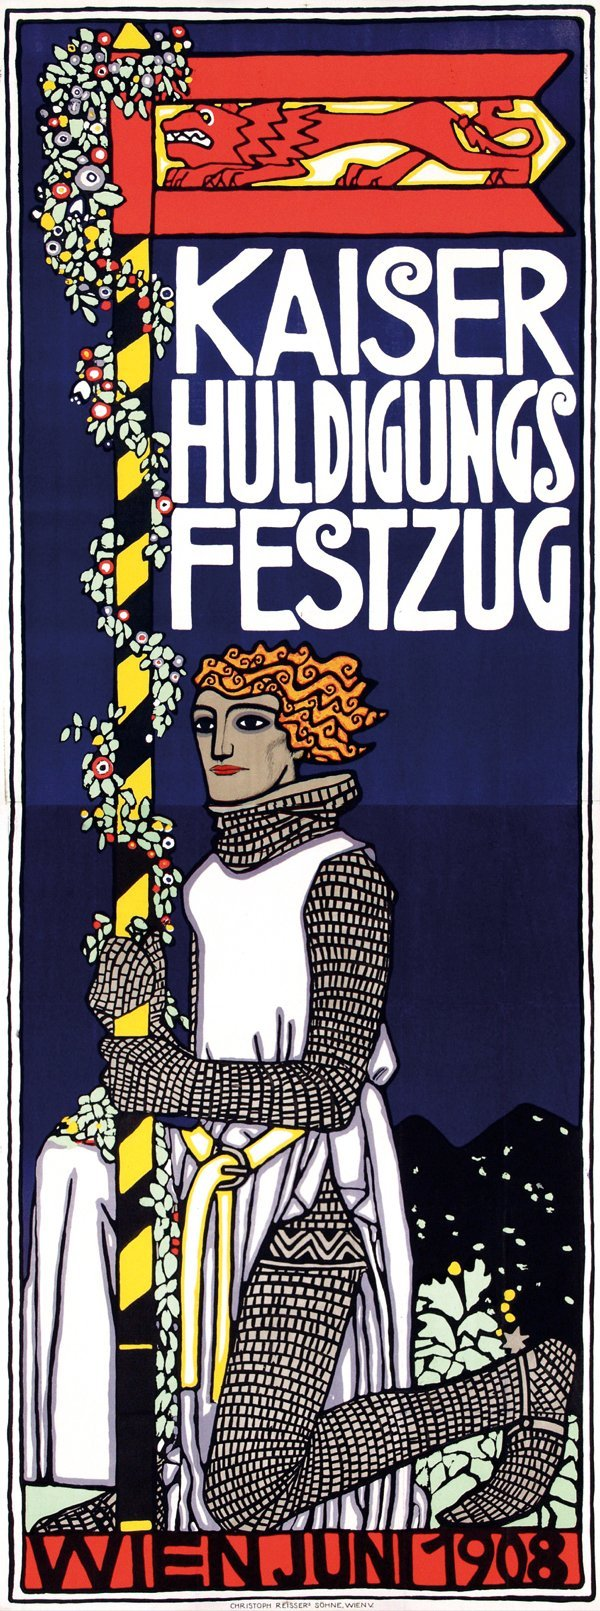 845: Poster by Bertold Löffler - Kaiser Huldigungs Fest